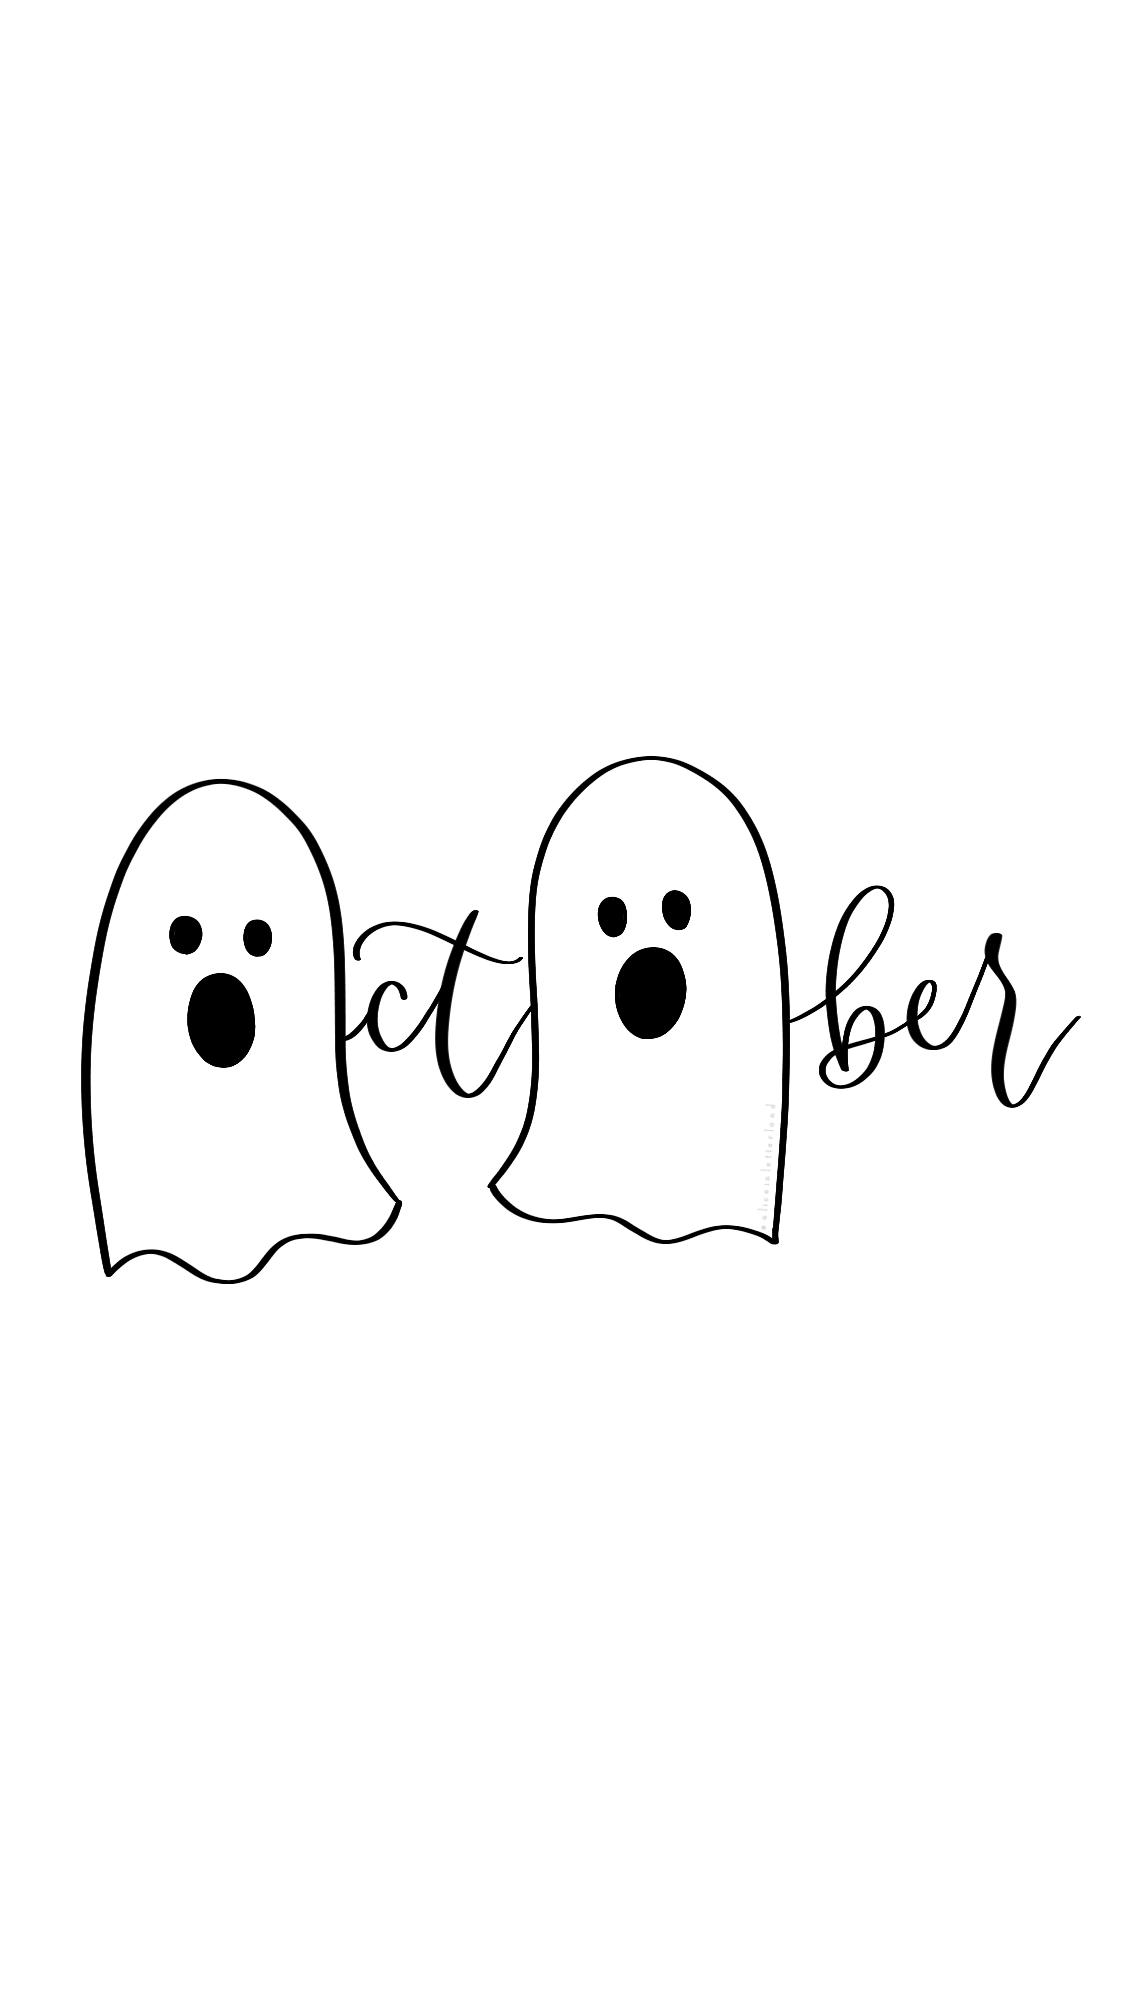 Cute Halloween / October wallpaper #octoberwallpaper Cute Halloween / October wallpaper #octoberwallpaper